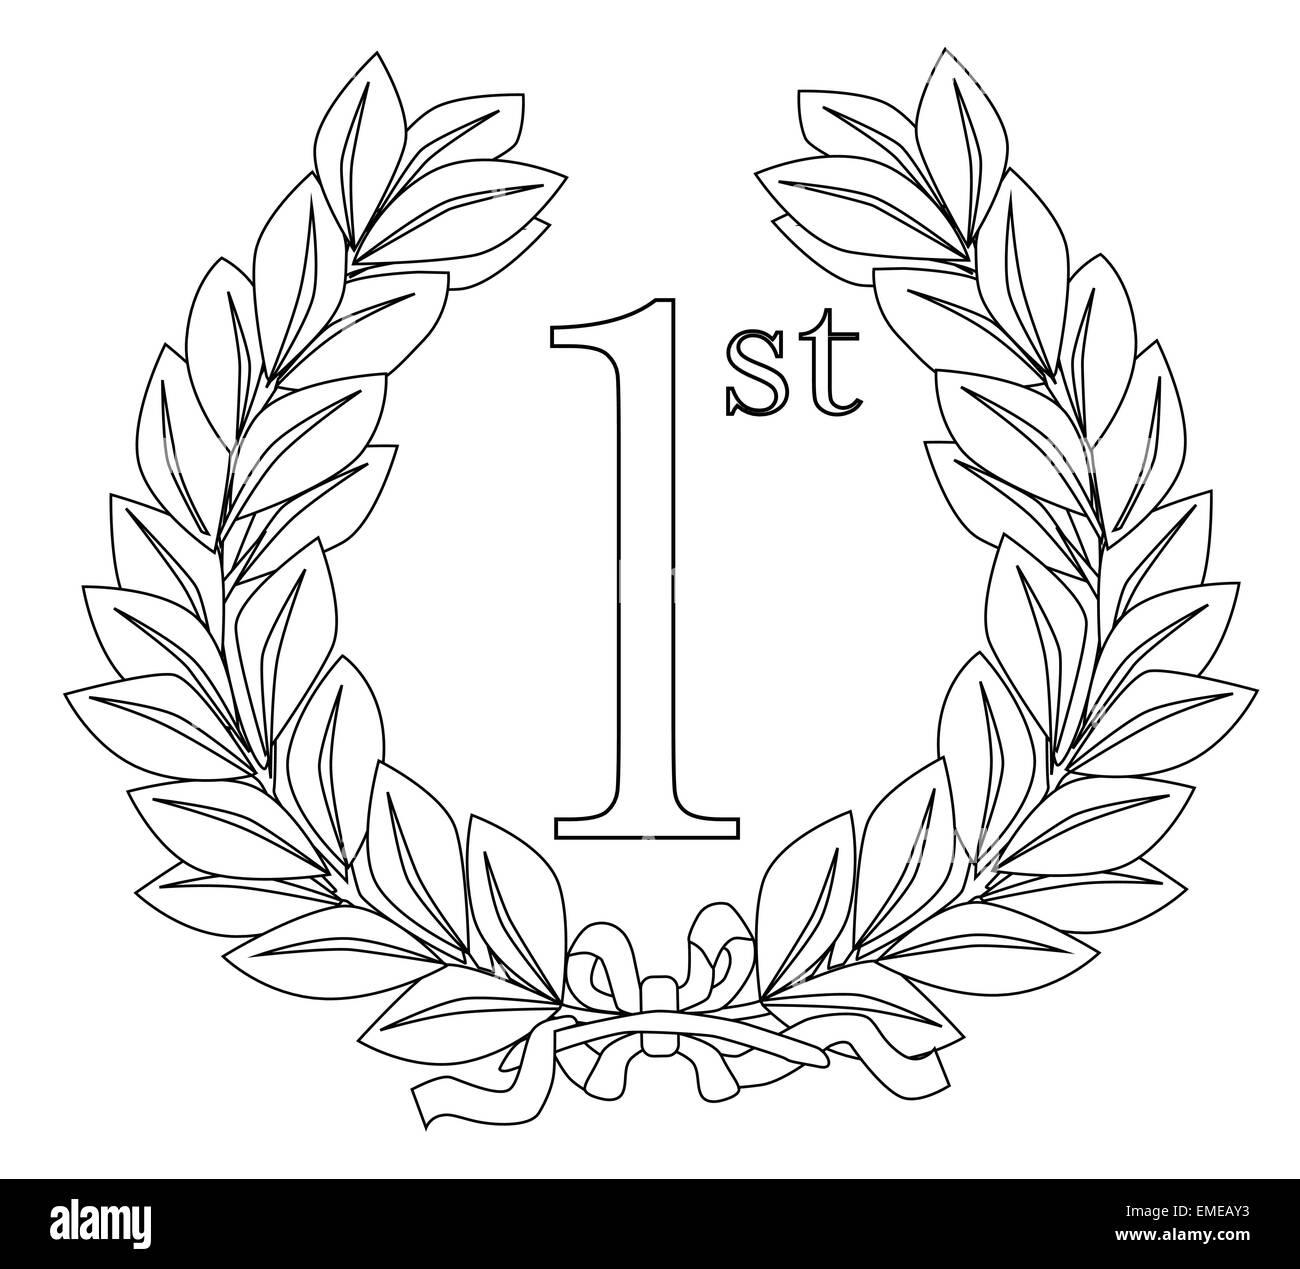 1st Laurel Wreath - Stock Image